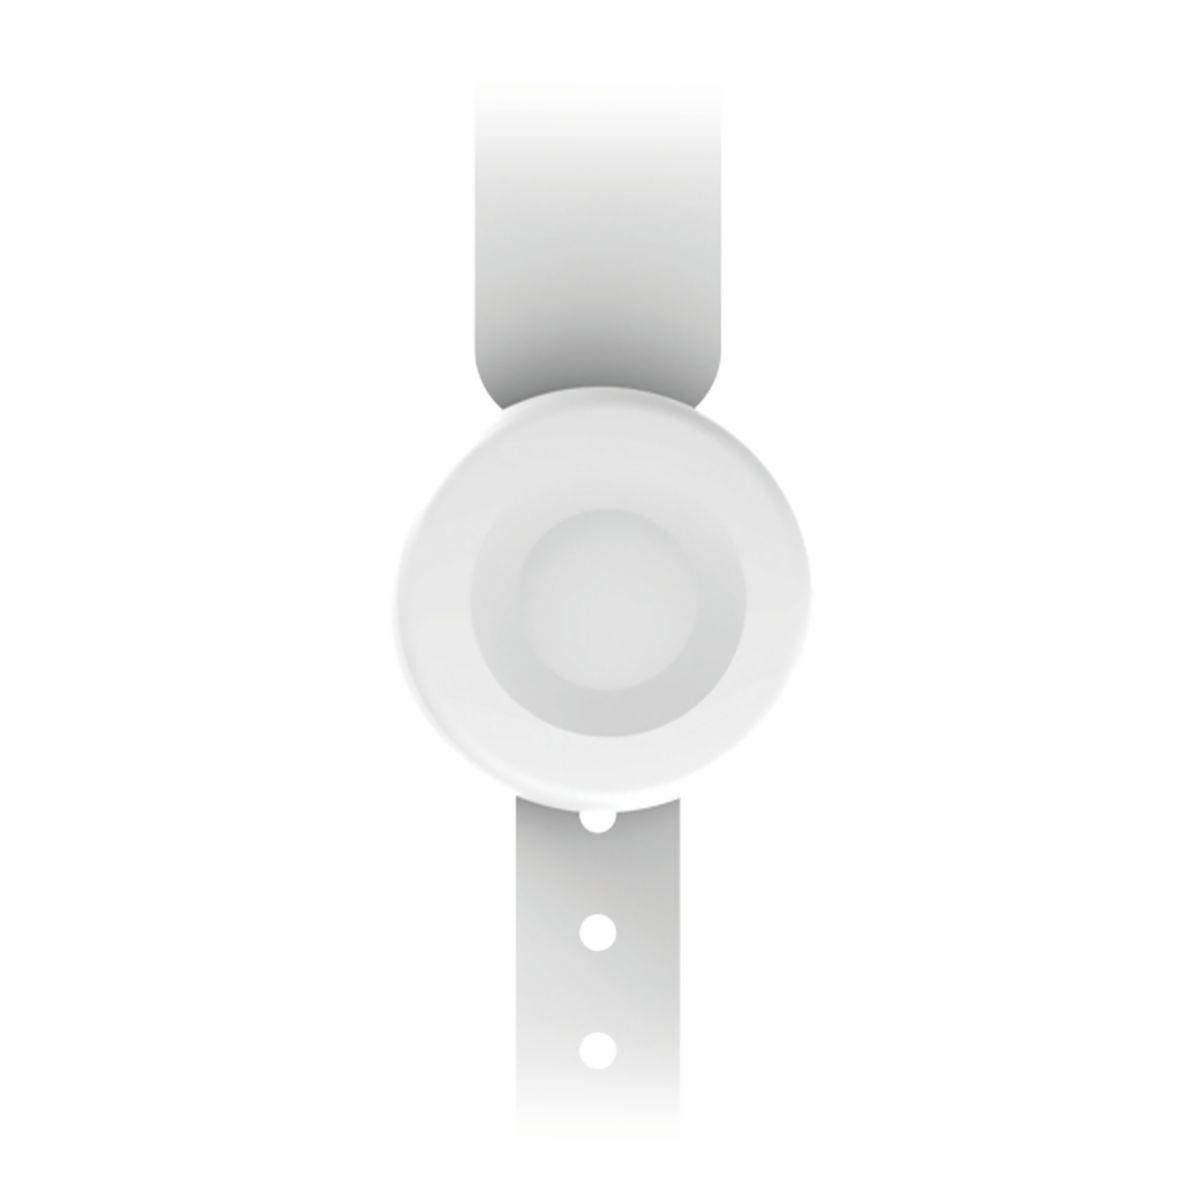 Trellix Locate Bracelet Tag with Pushbutton TRX-TAG-BRC7